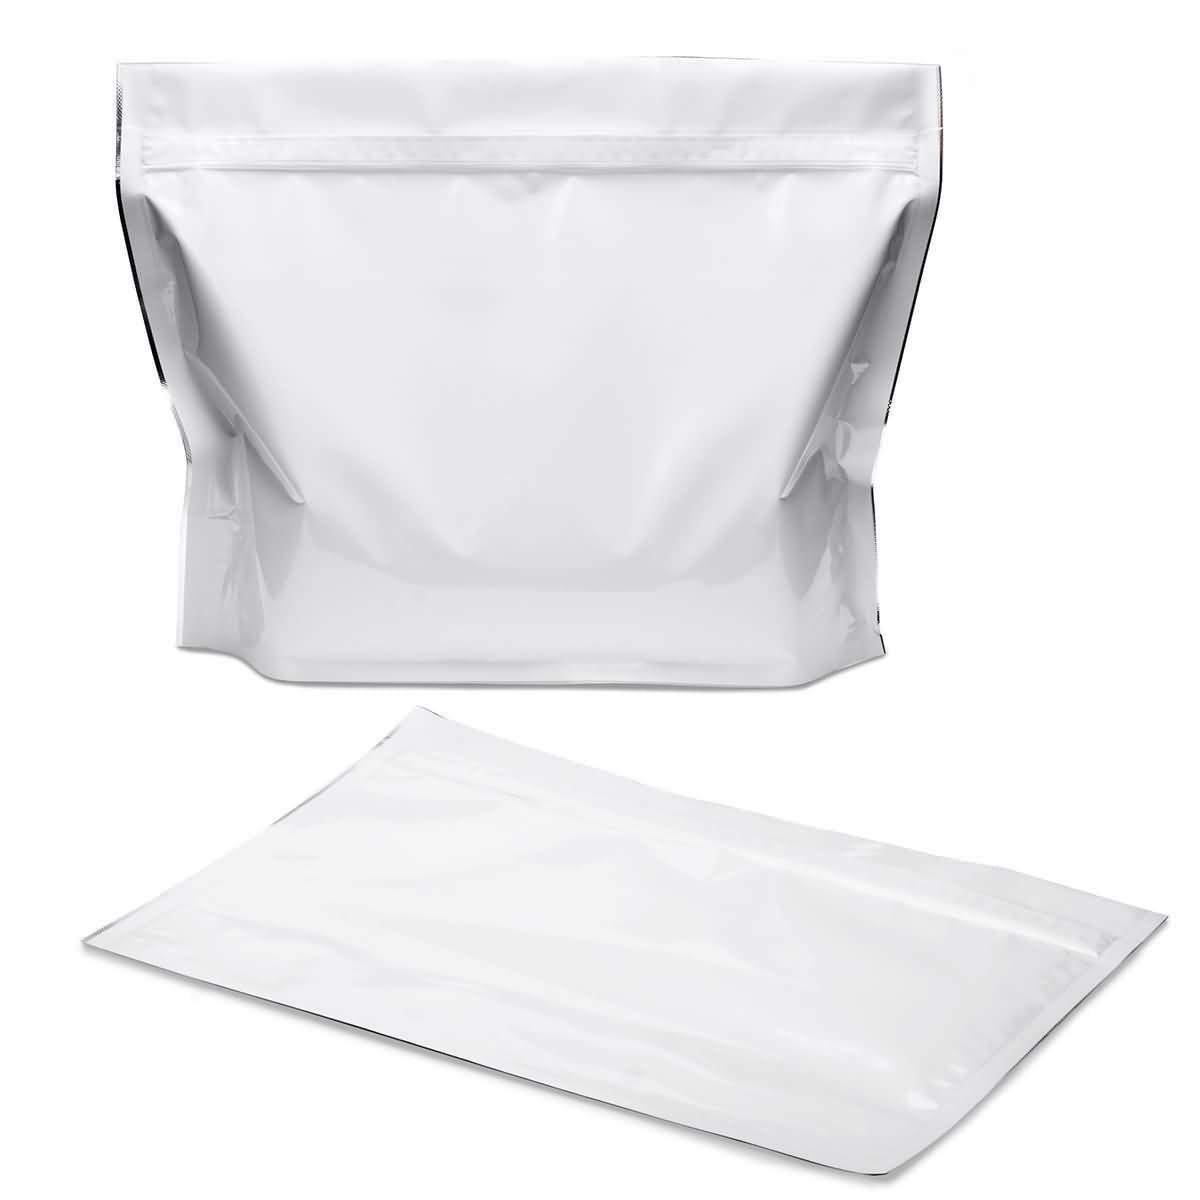 2222 2 White Child Resistant 12×9×4 (Exit Bag) – 100 Pack